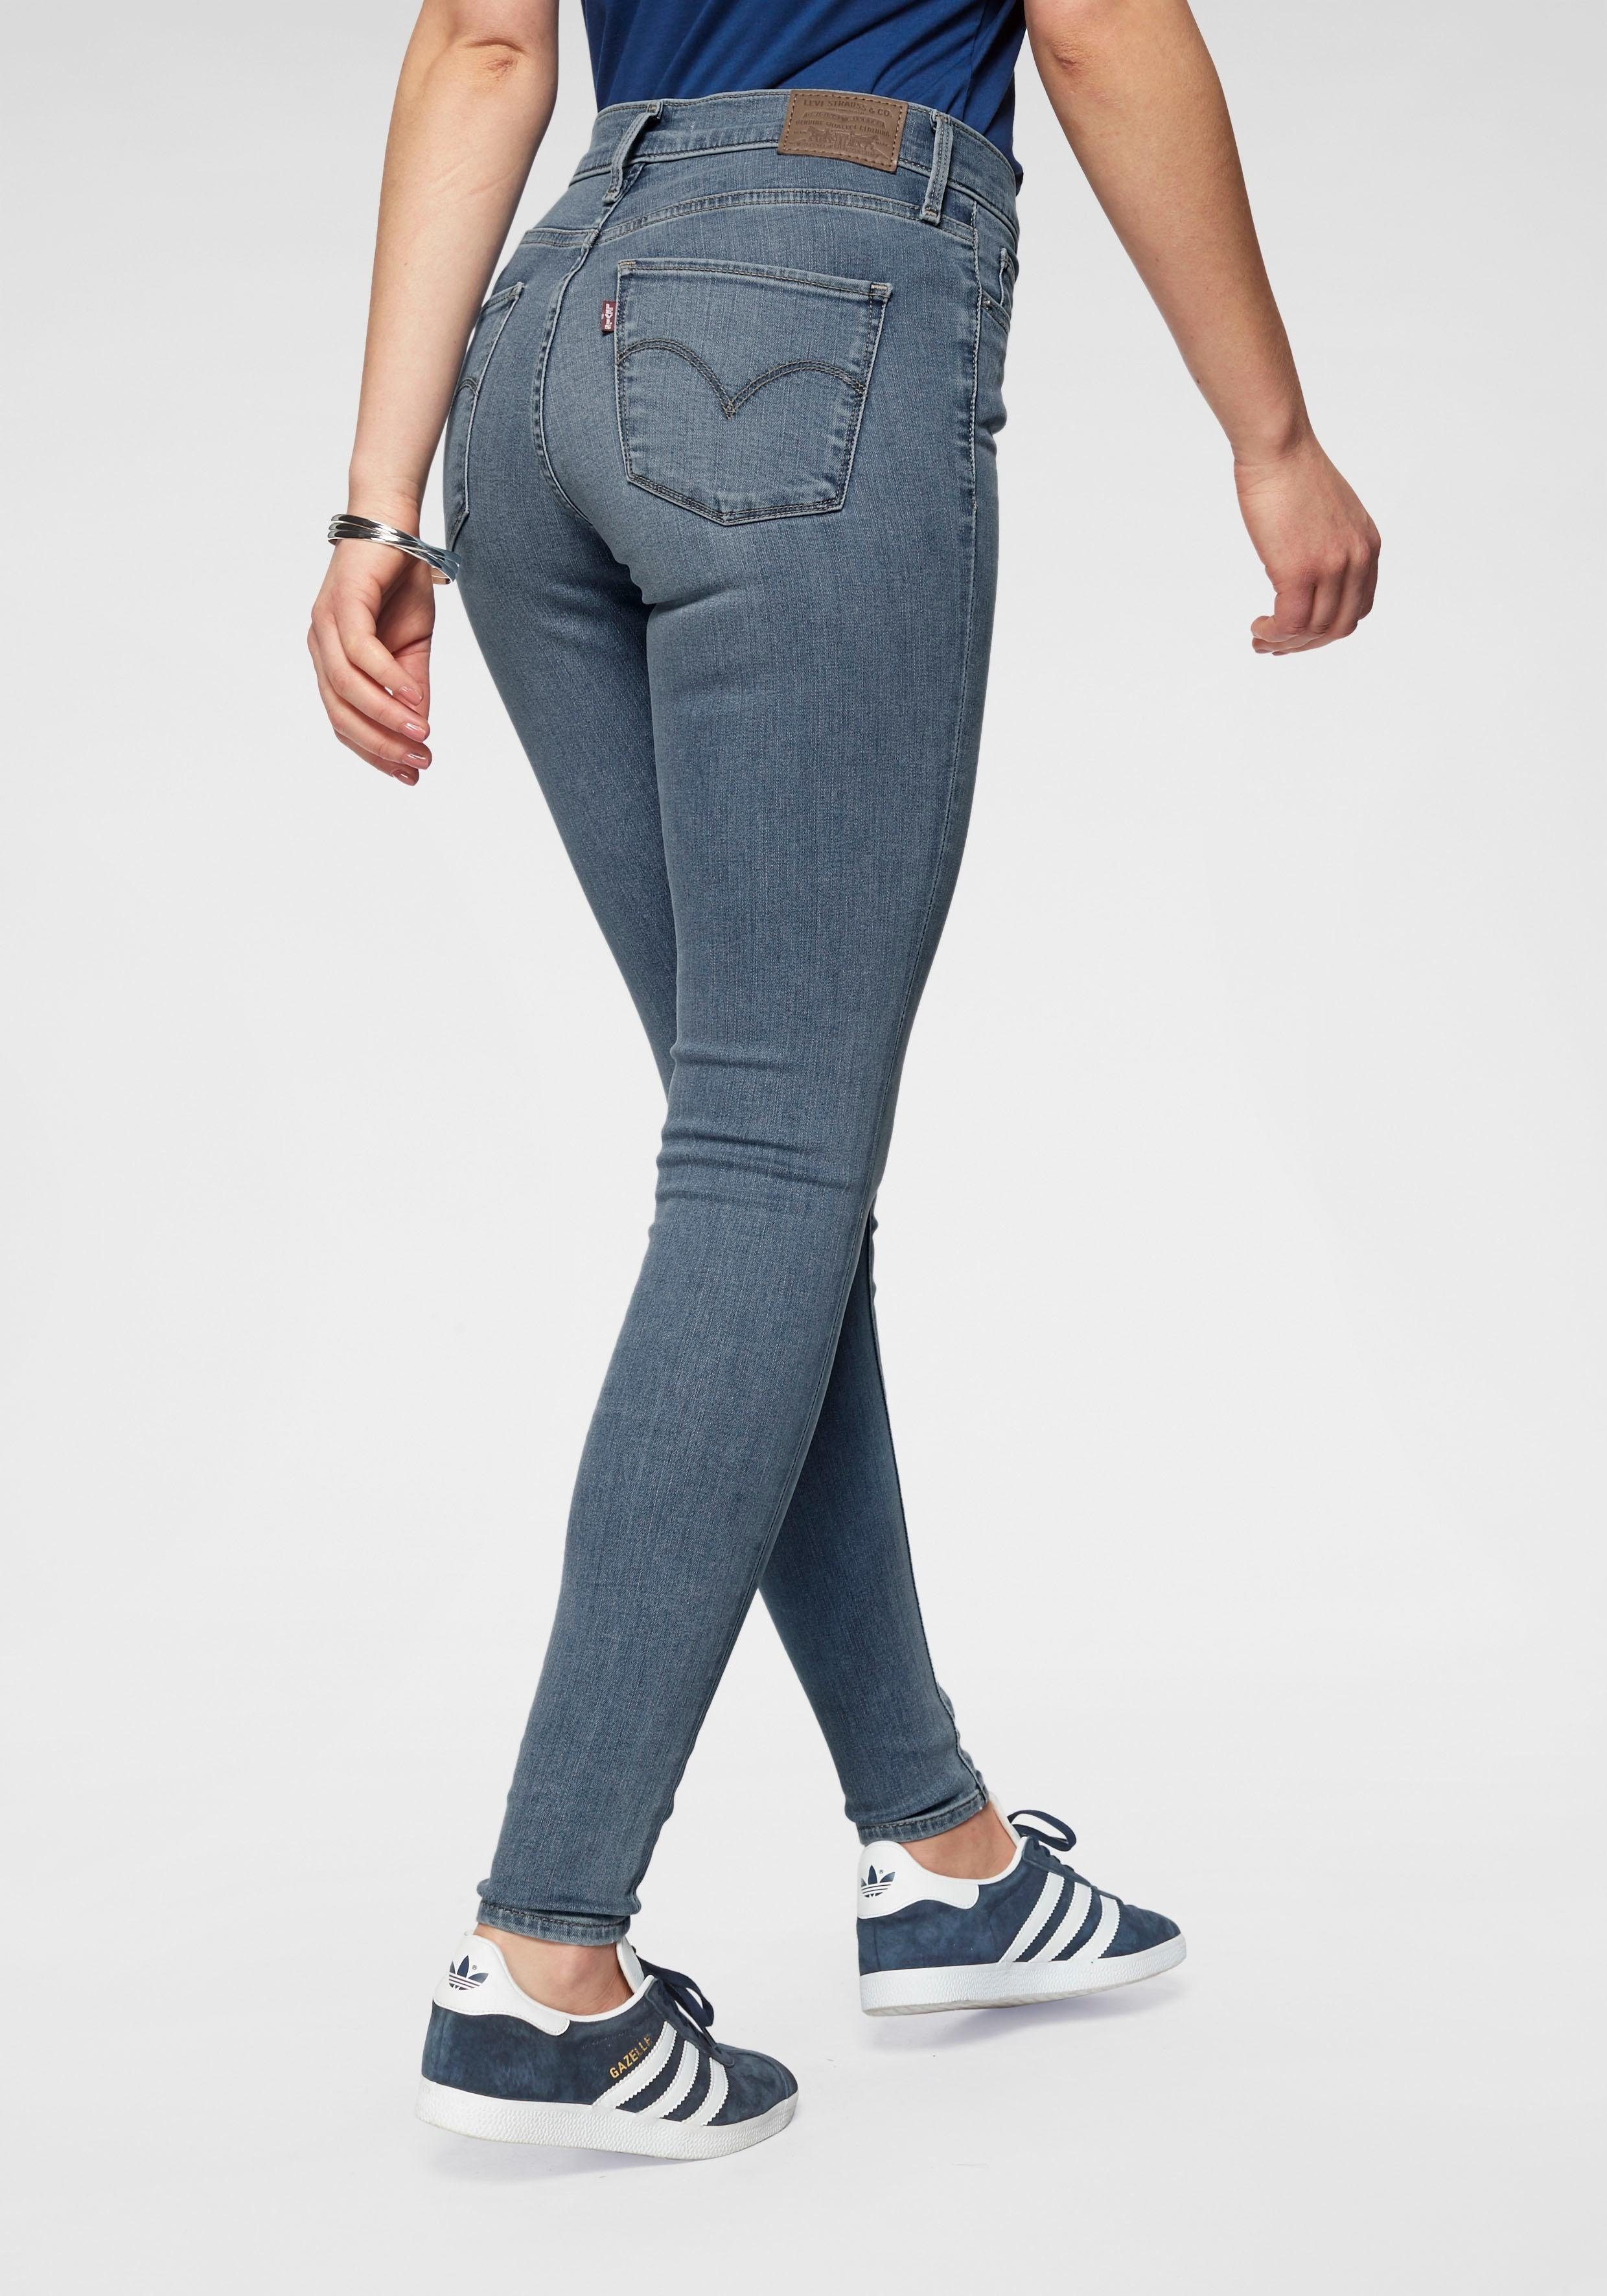 LEVI'S ® skinny jeans »310« goedkoop op otto.nl kopen